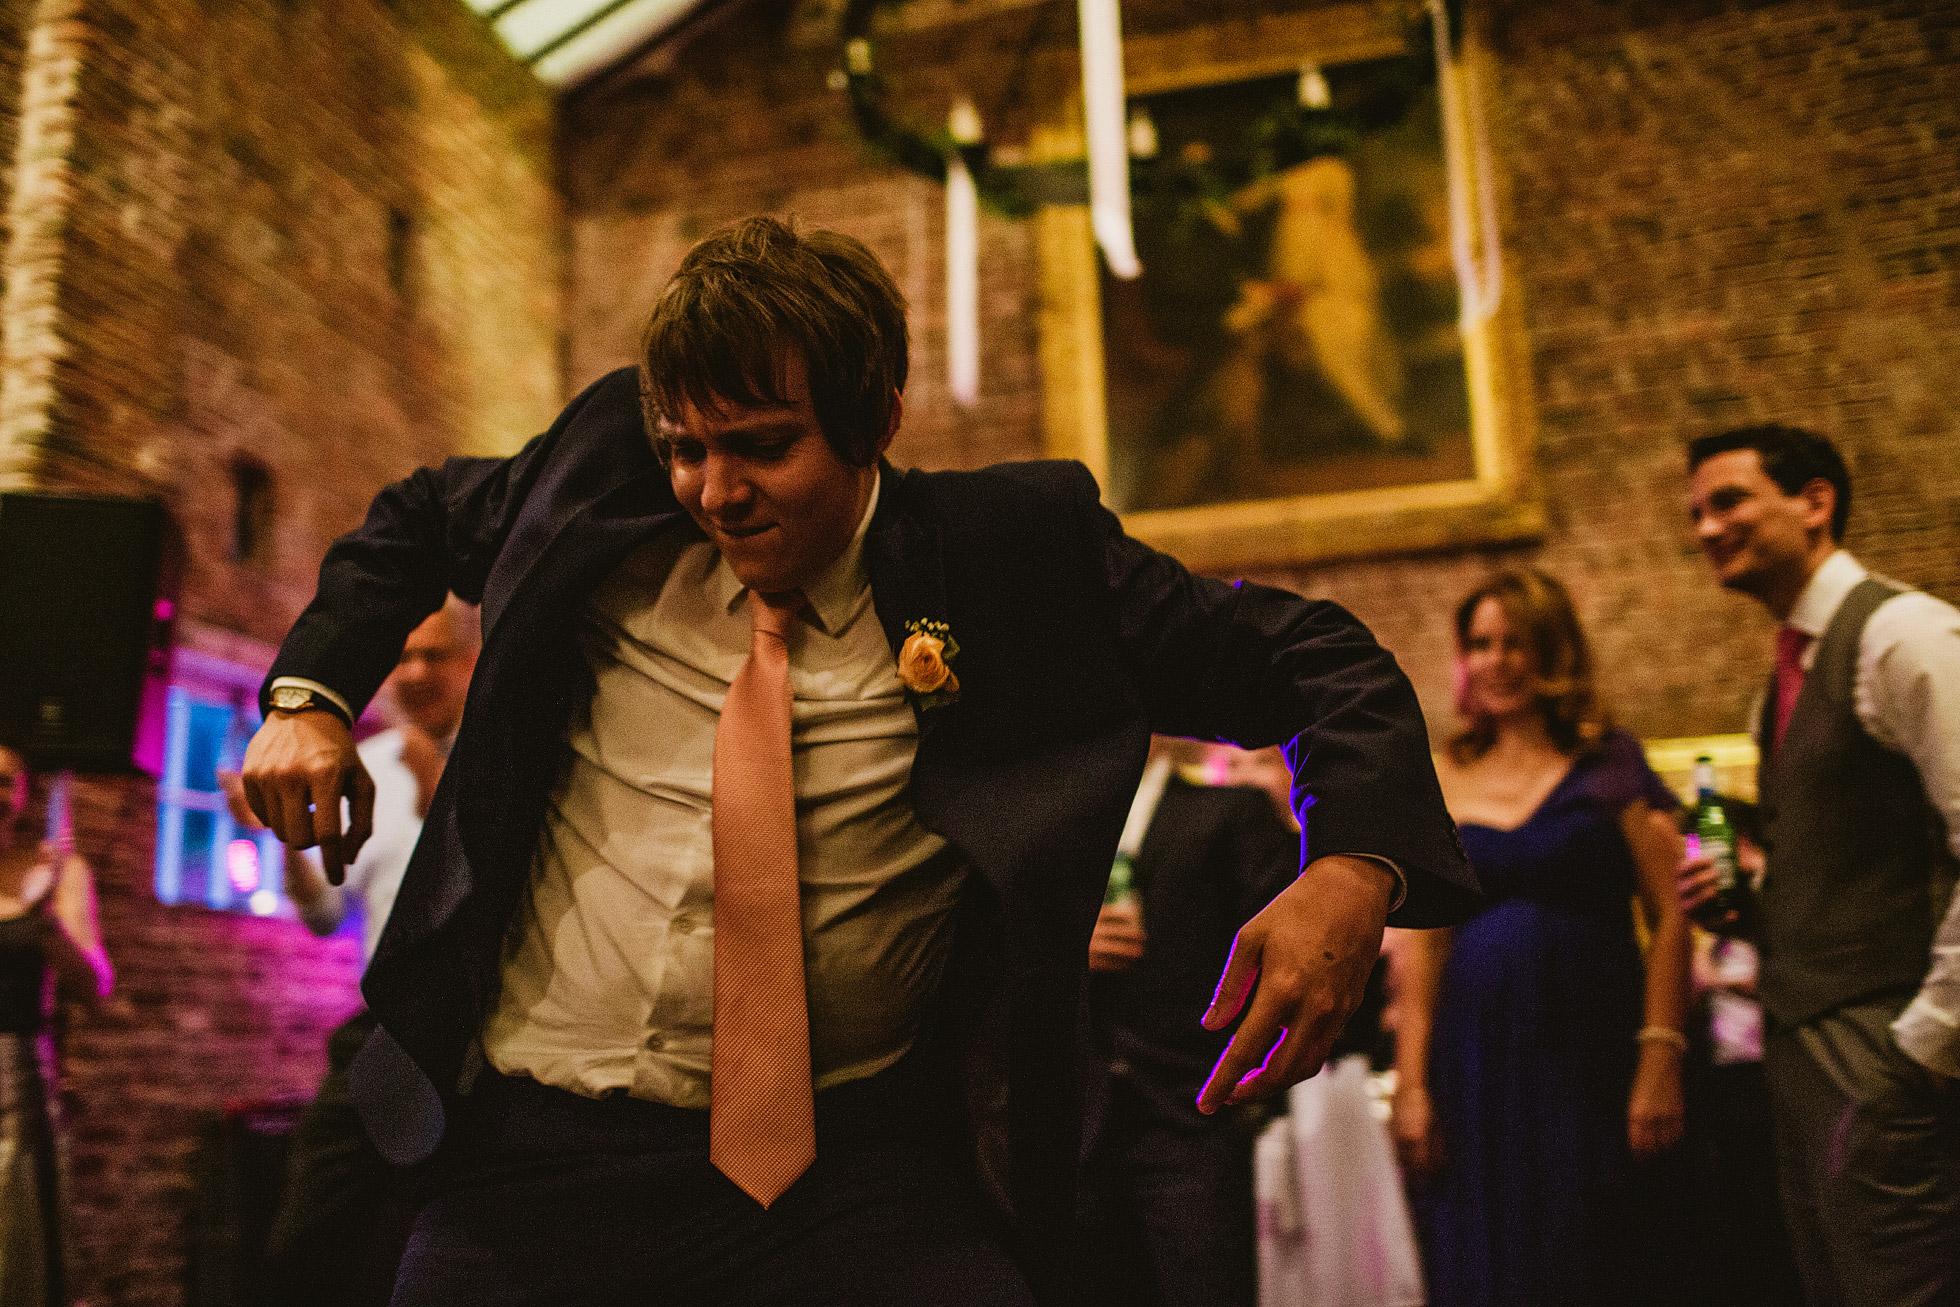 Meols Hall Weddings